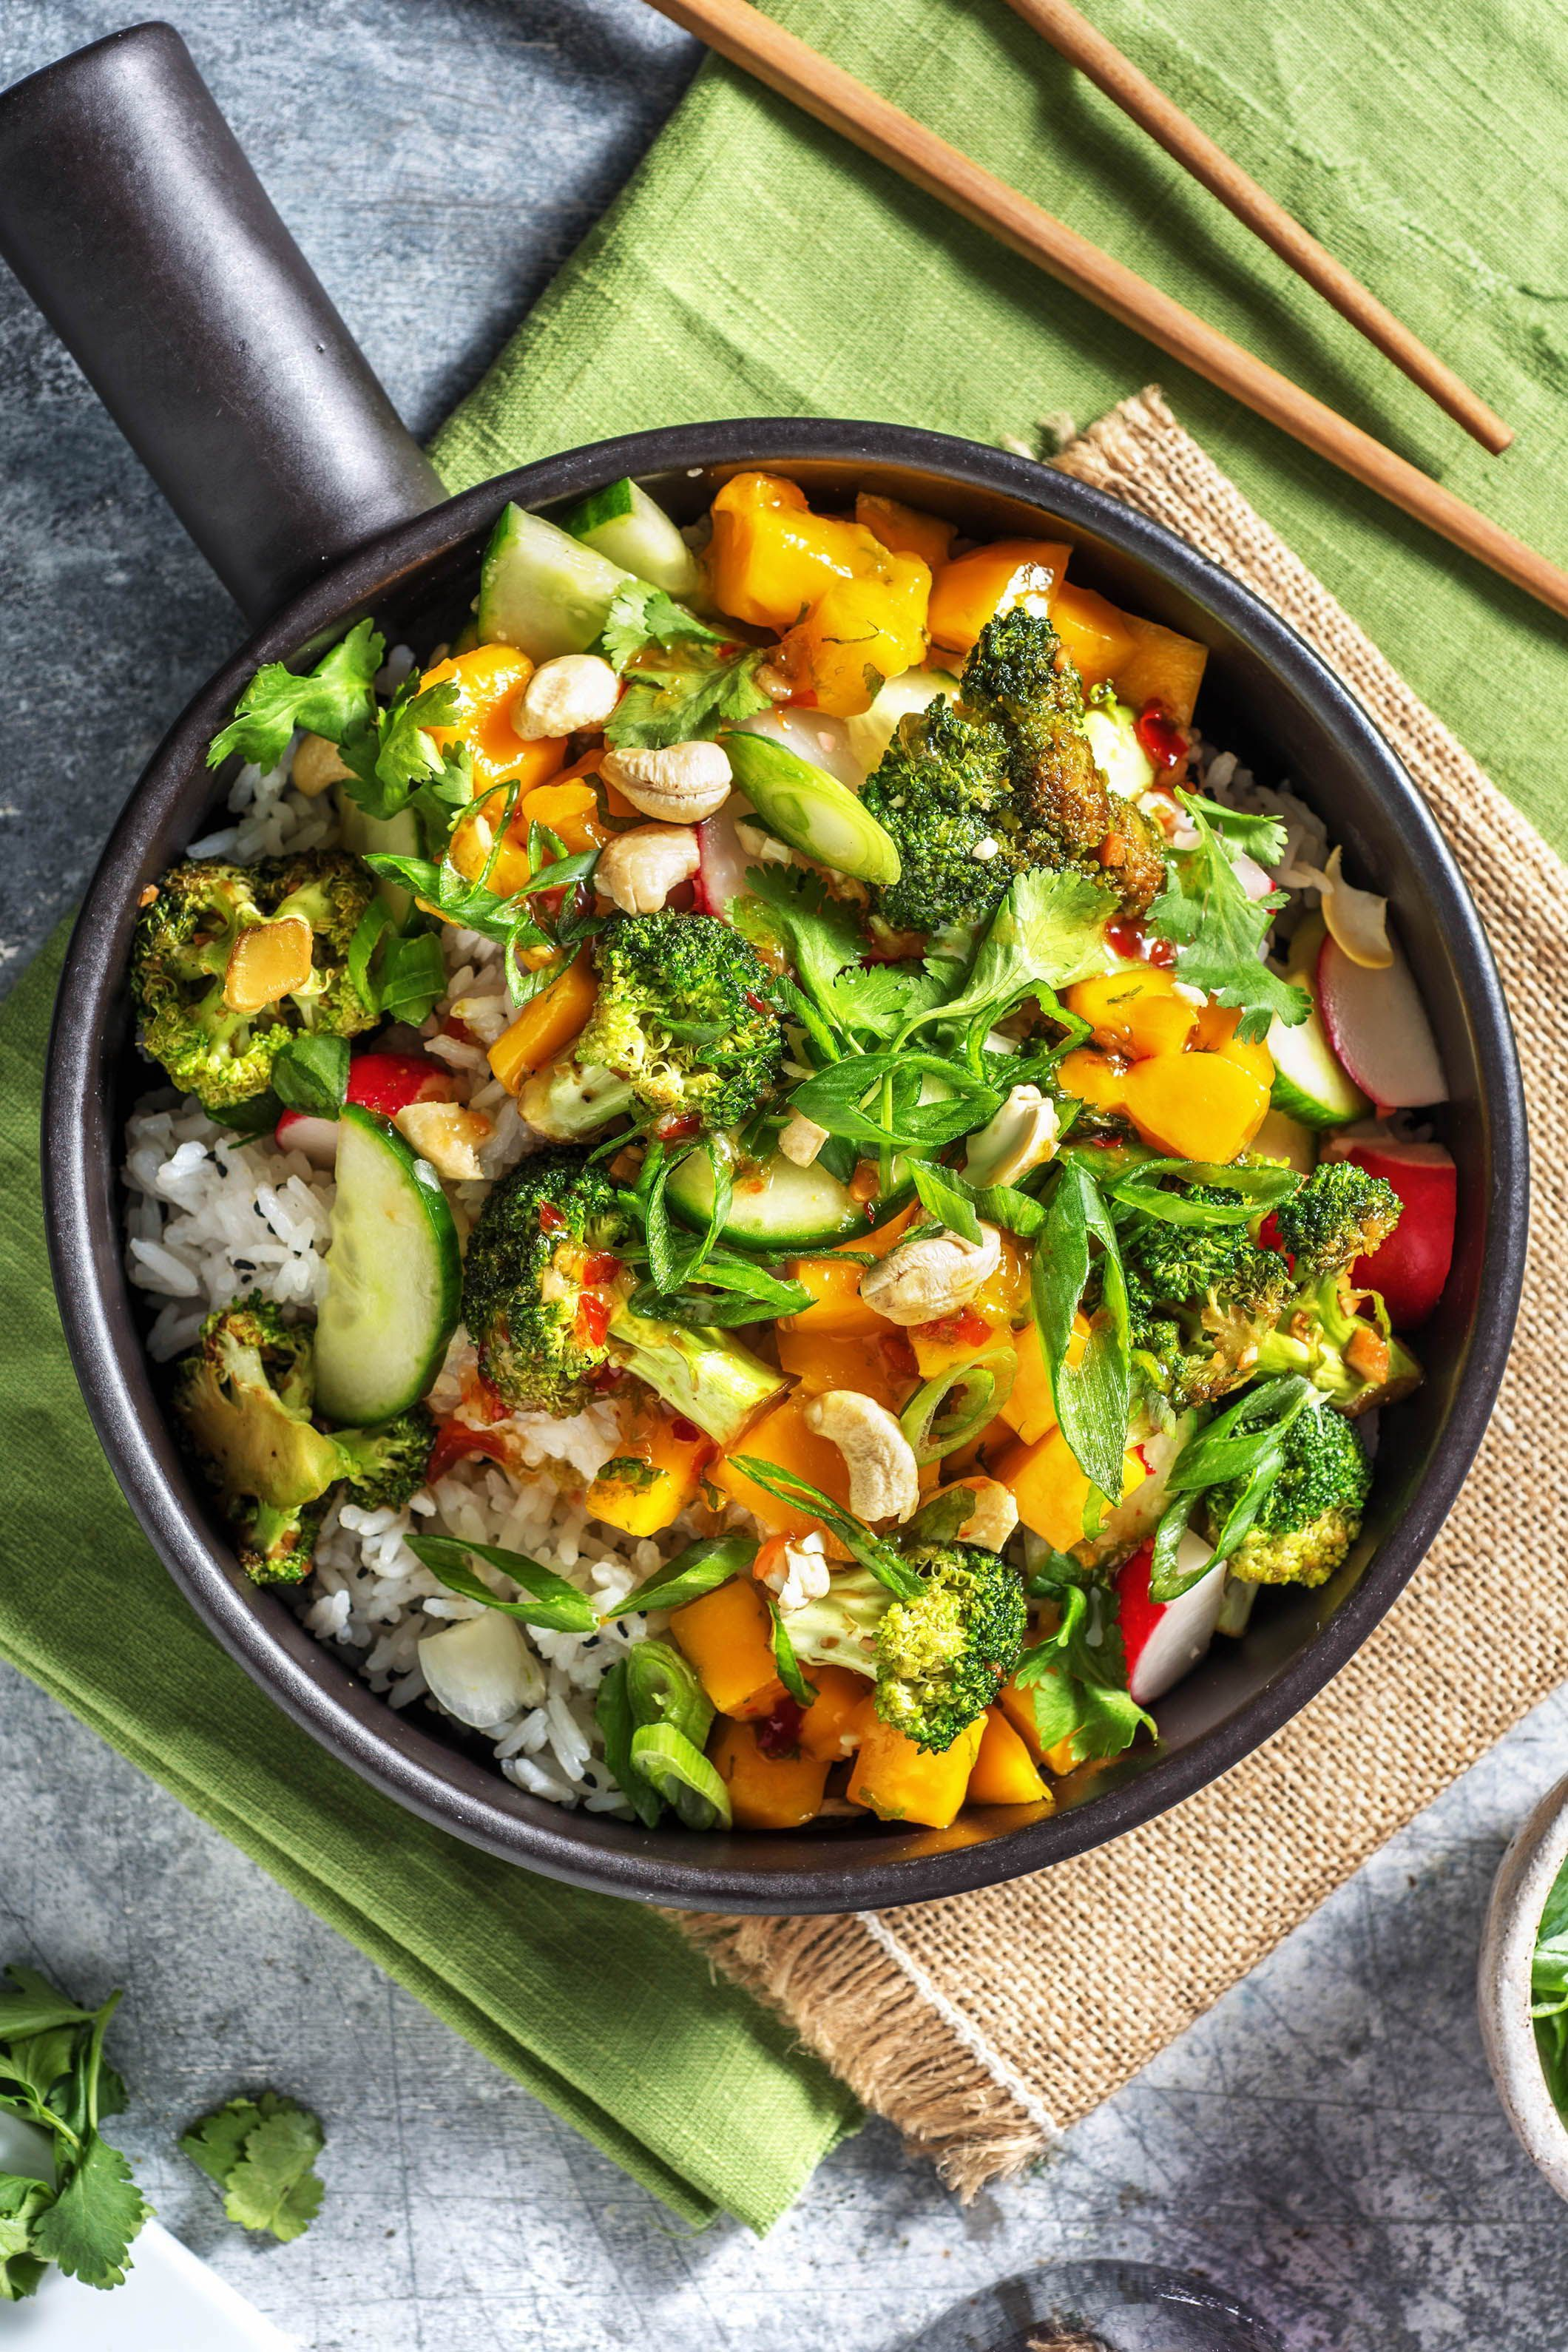 Summer bowl with mango rice recipe Hello Fresh  Recipe for Summer bowl with mango rice with spicy broccoli and radishcucumber salad vegetarian an